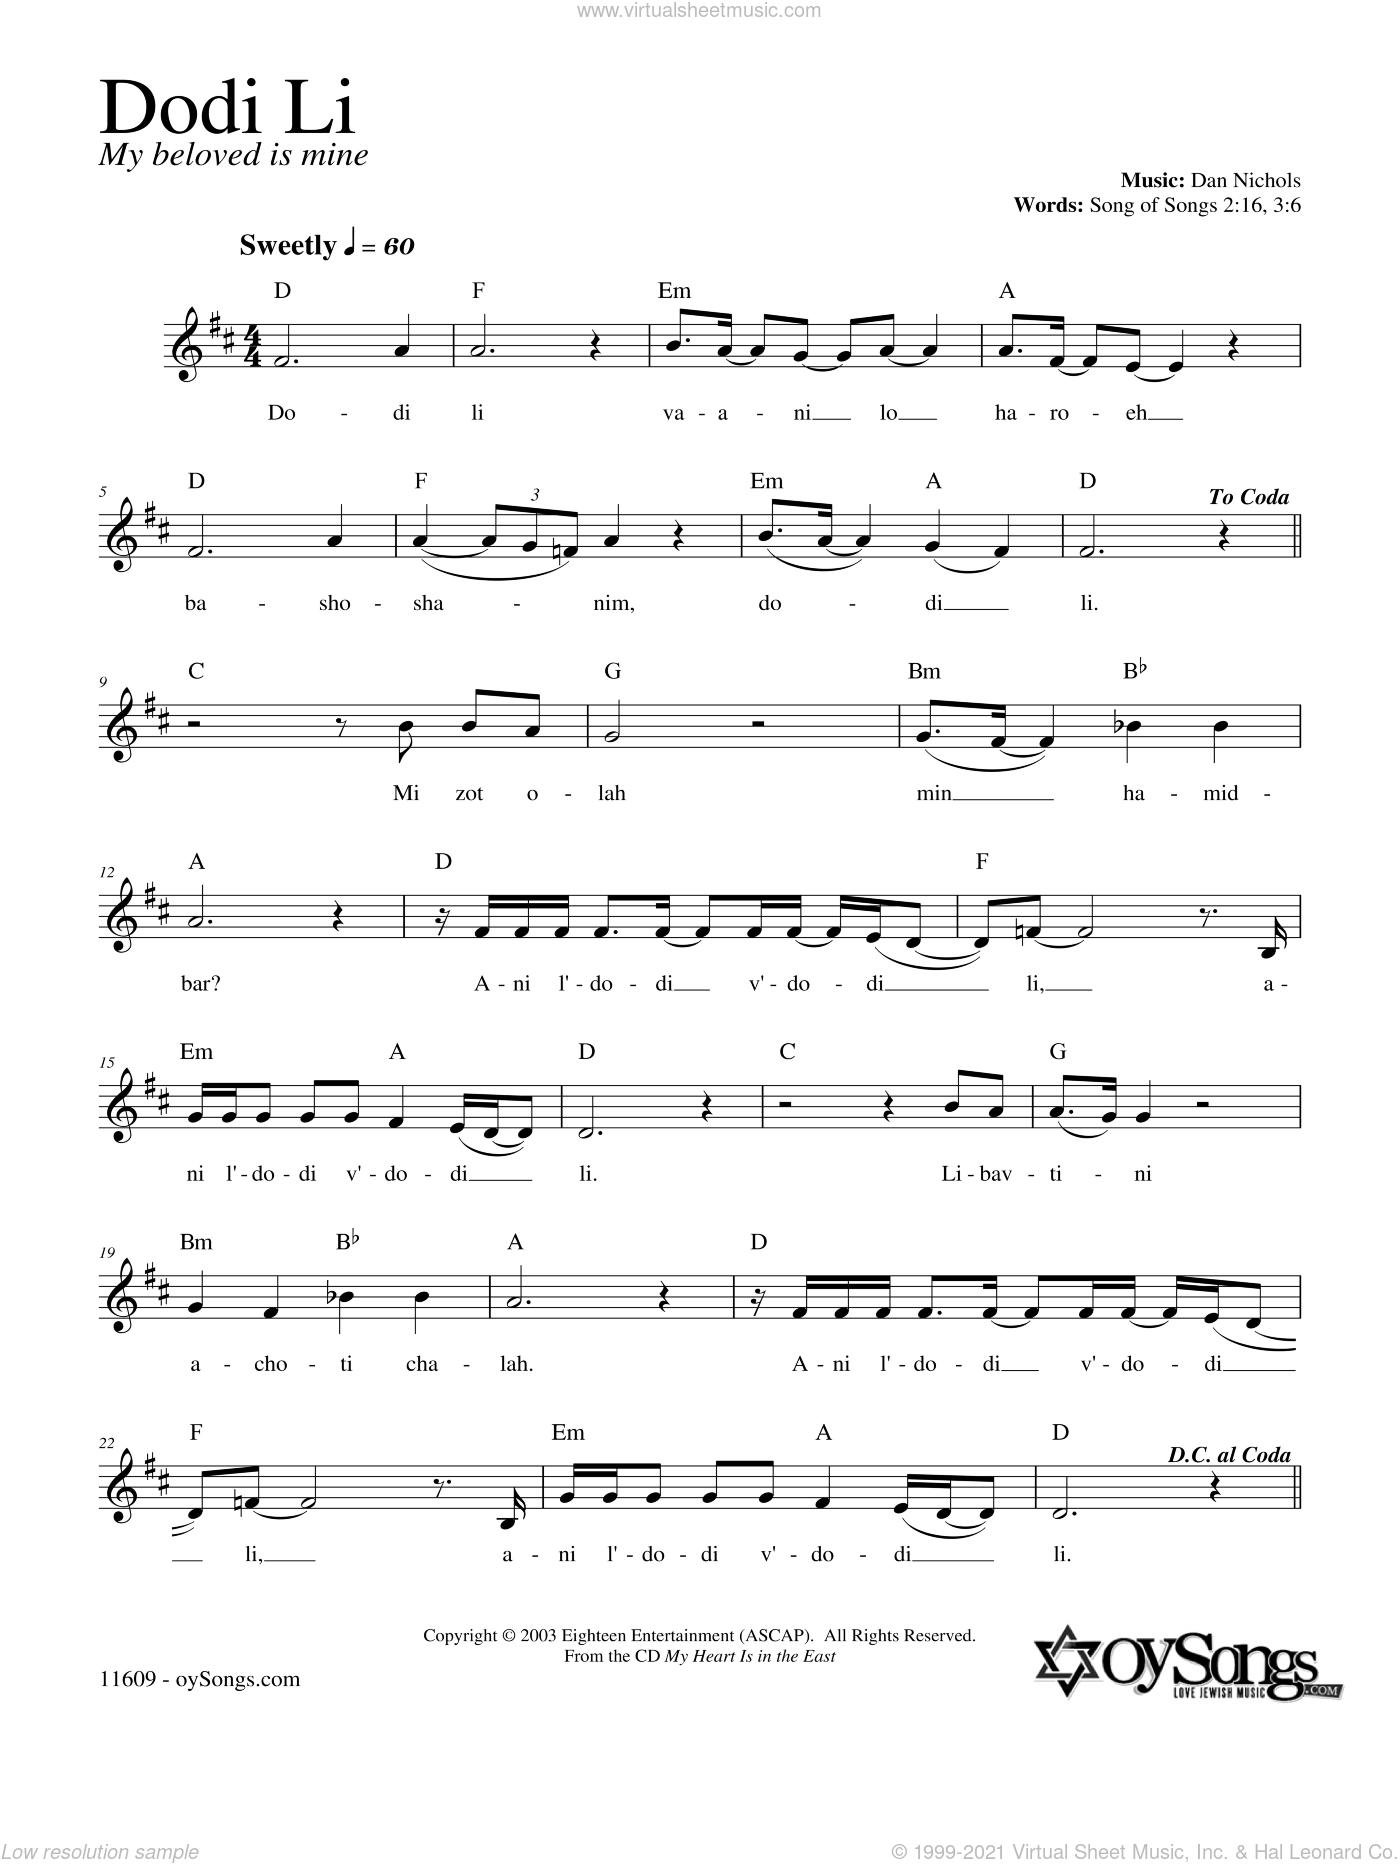 Dodi Li sheet music for voice and other instruments (fake book) by Dan Nichols, intermediate skill level